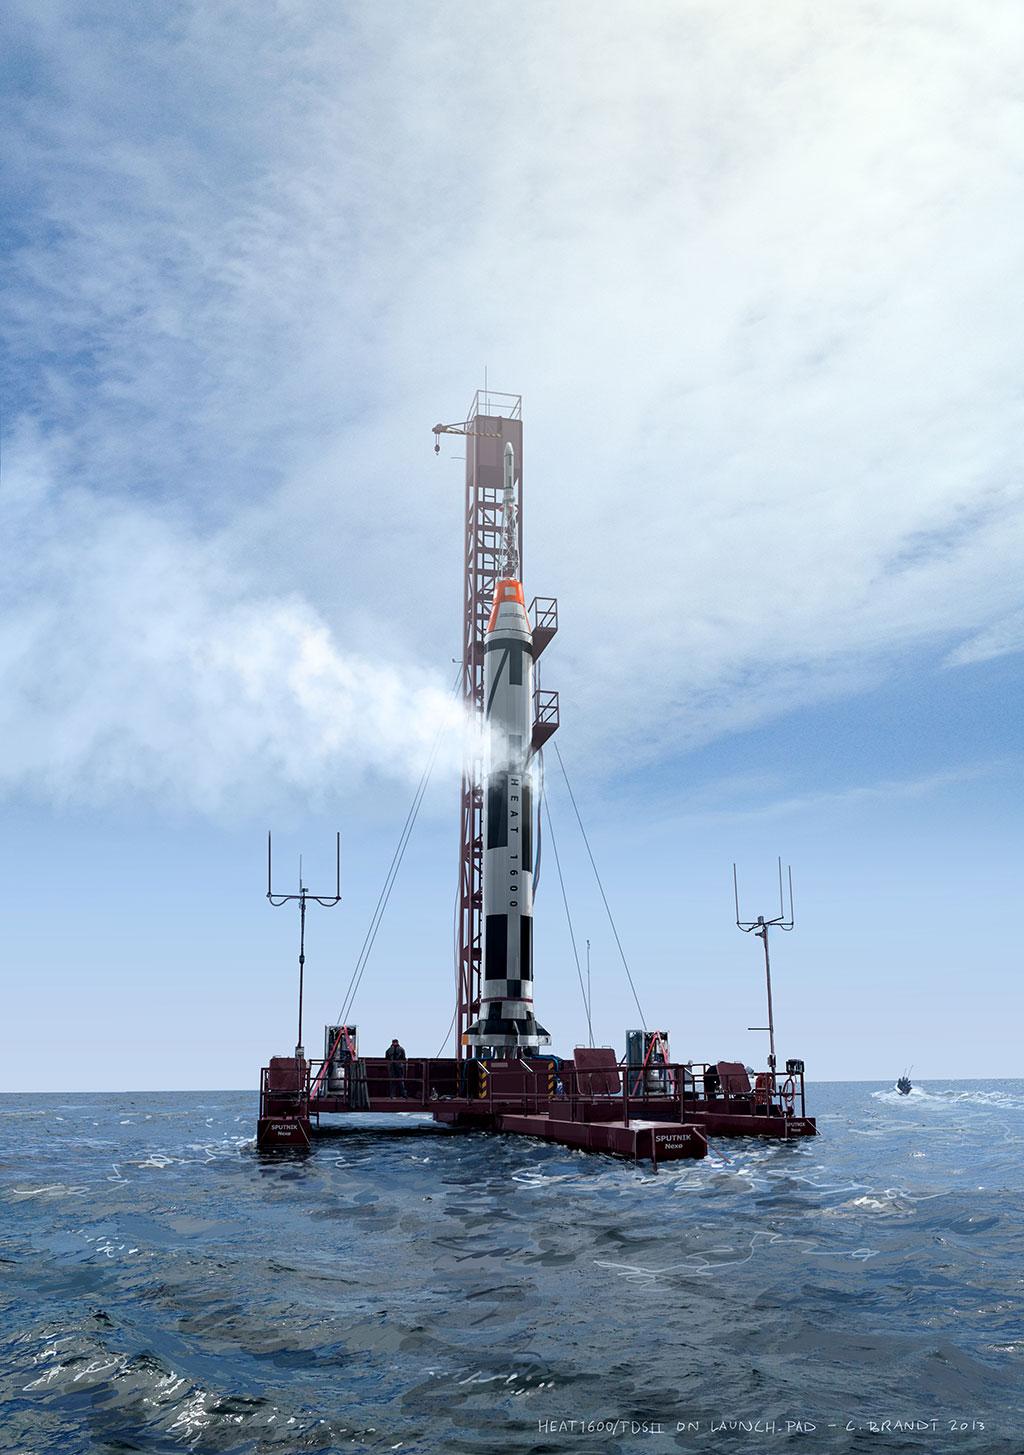 Copenhagen Suborbitals - TDSII/HEAT1600 on the launch platform Sputnik. Photoshop painting. Carsten Brandt 2013